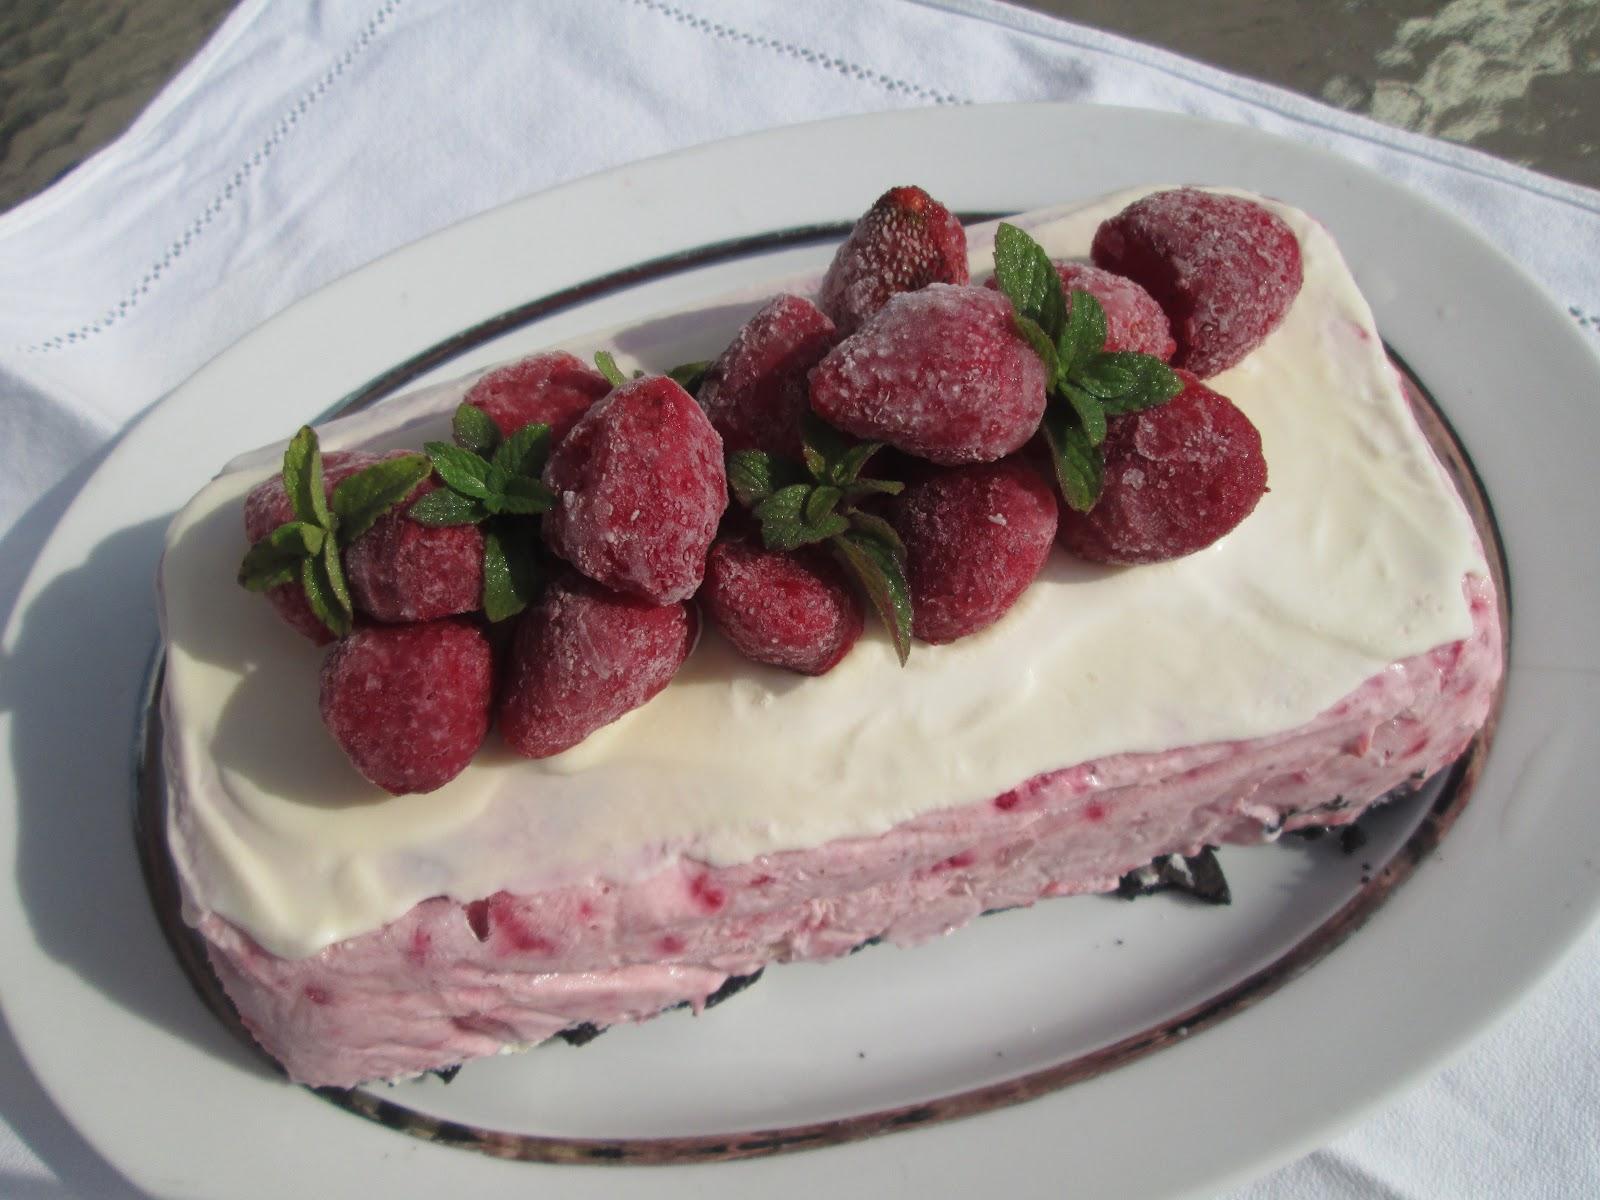 Canela kitchen (gloria): Better than strawberries Ice cream